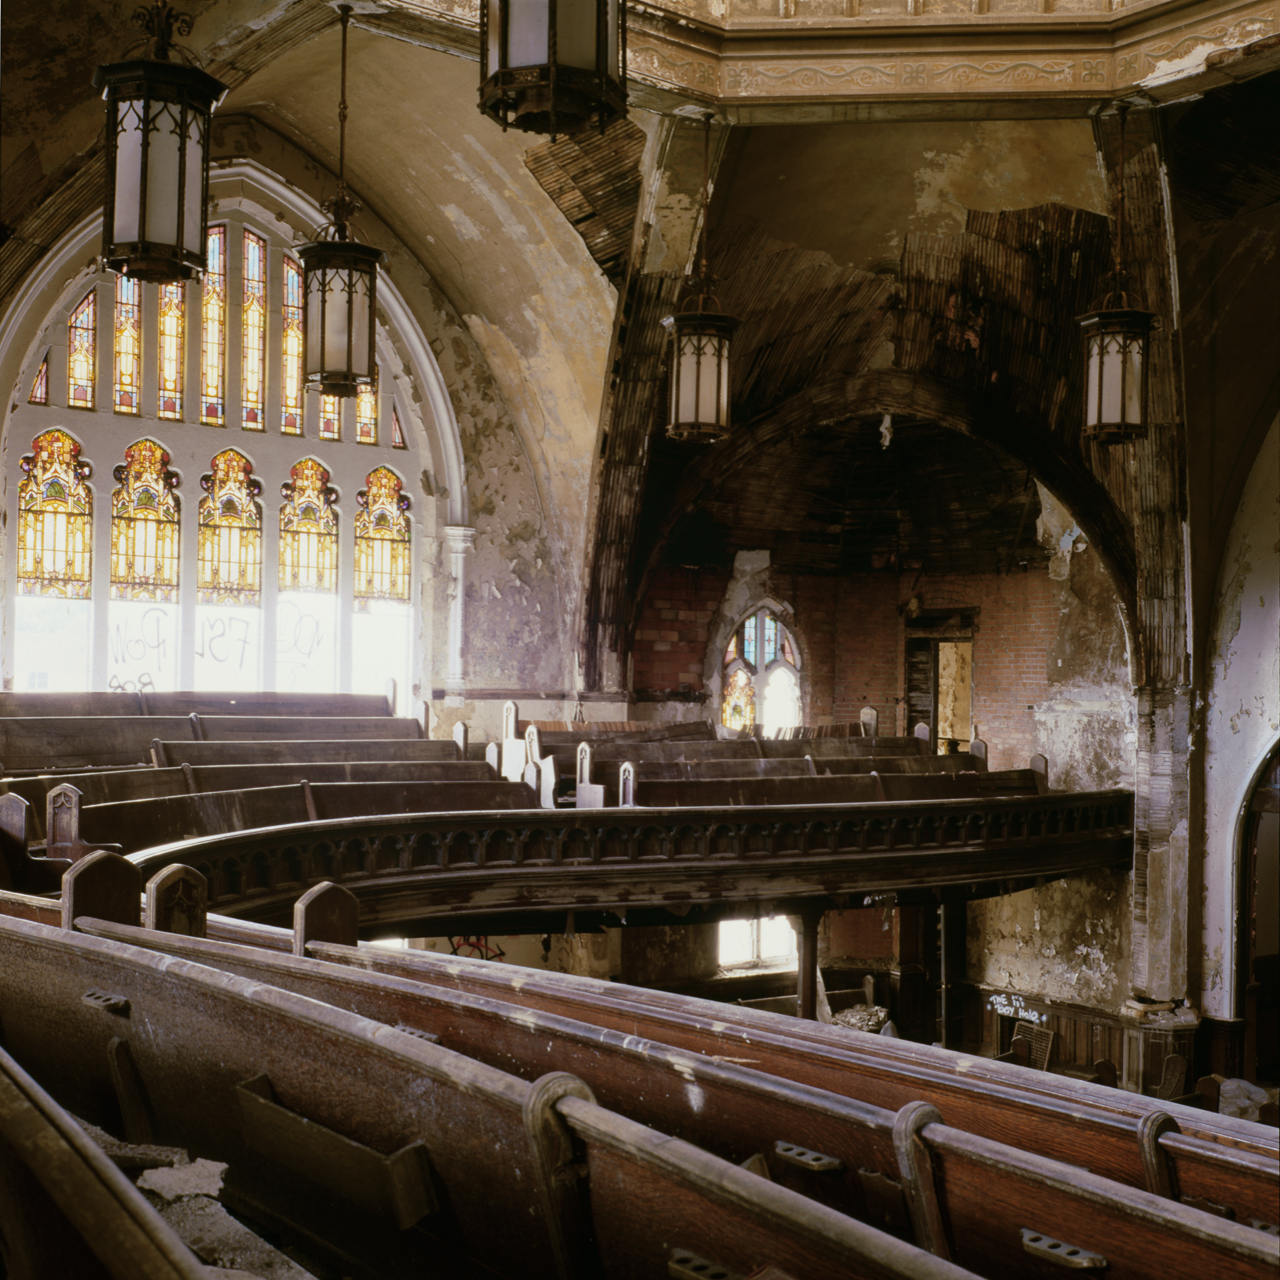 a-snapshot-of-faith-woodward-pc